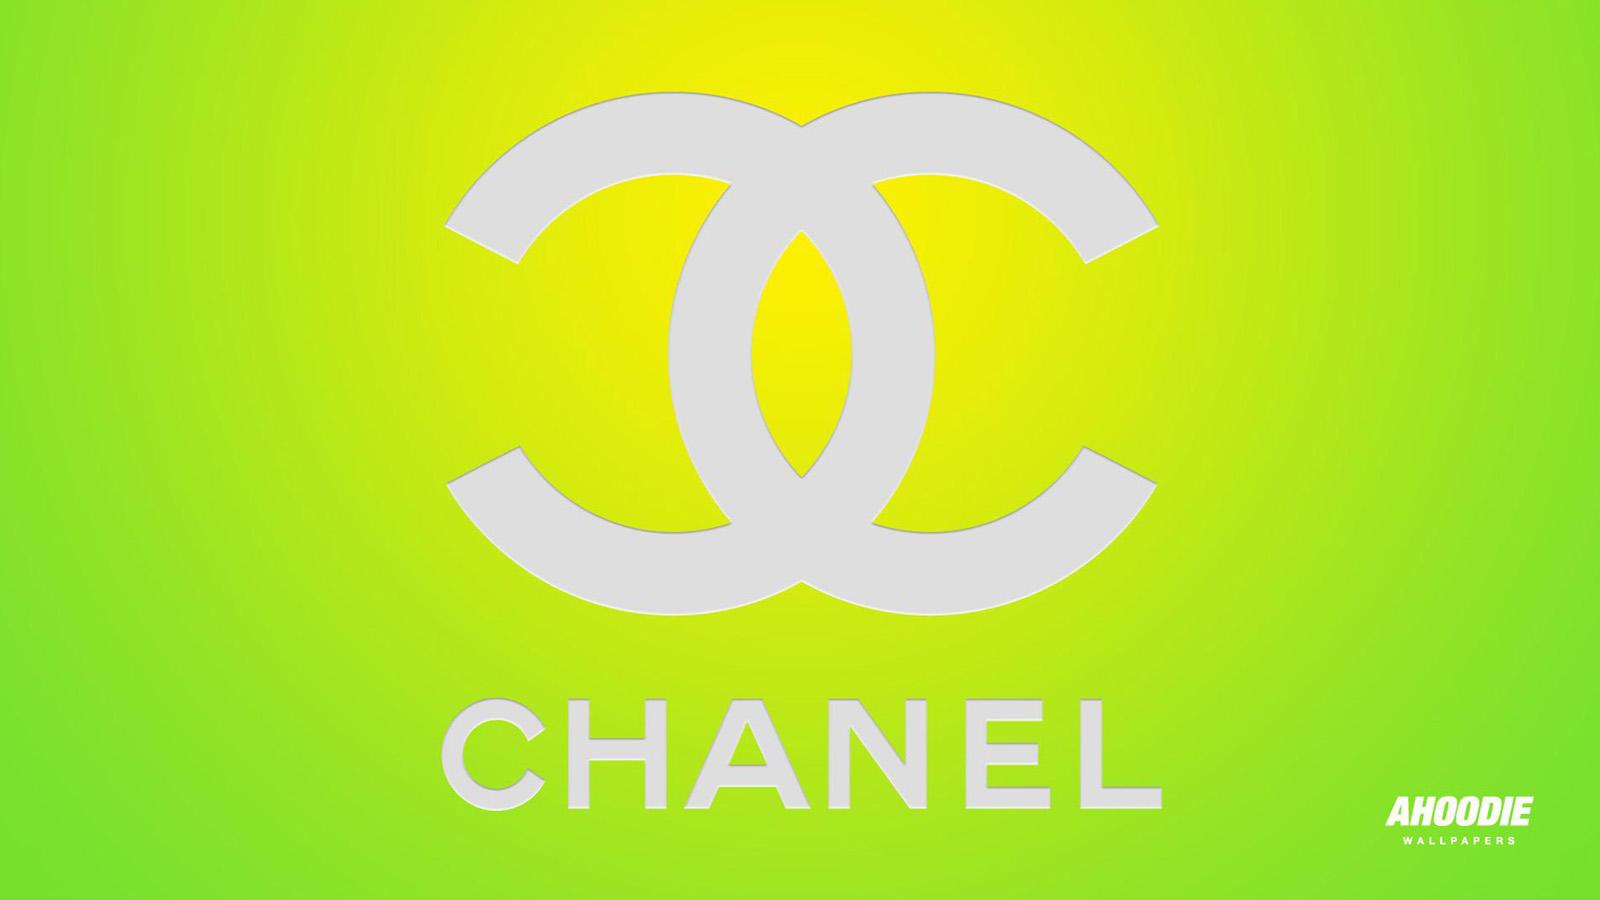 77 Chanel Logo Wallpaper On Wallpapersafari